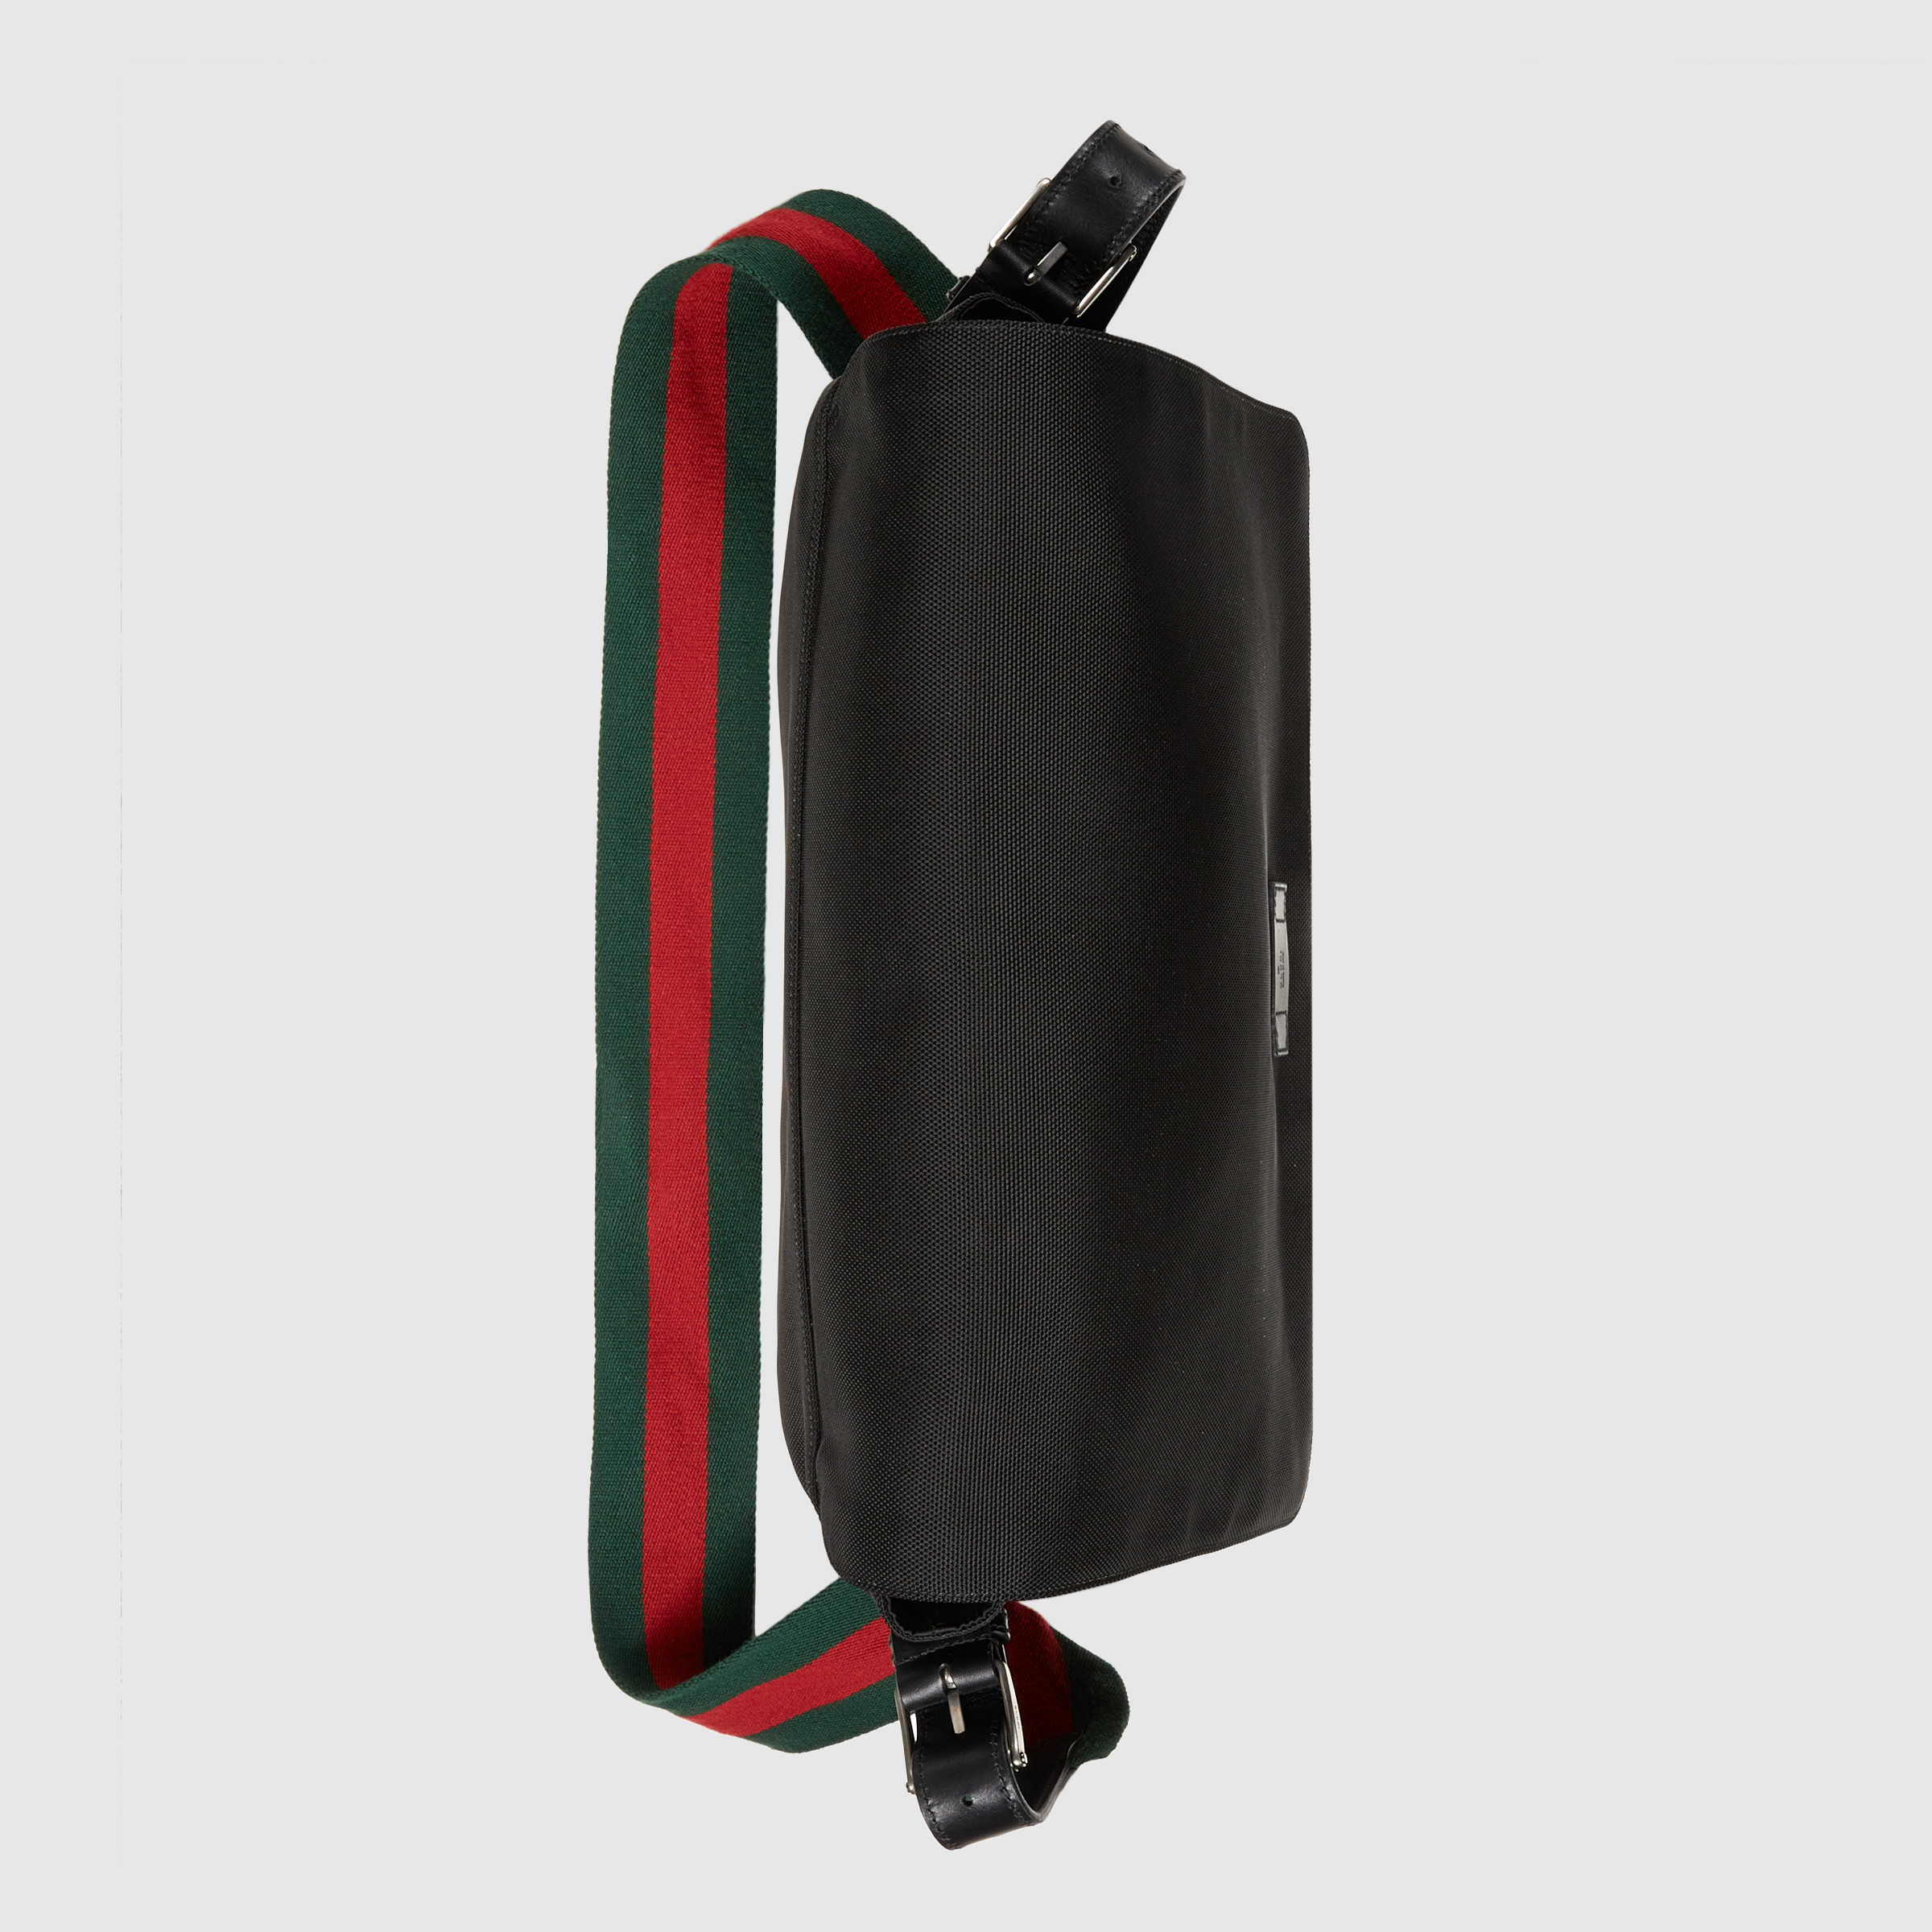 fd83731aedf1 Gucci Black Techno Canvas Messenger Bag | Stanford Center for ...